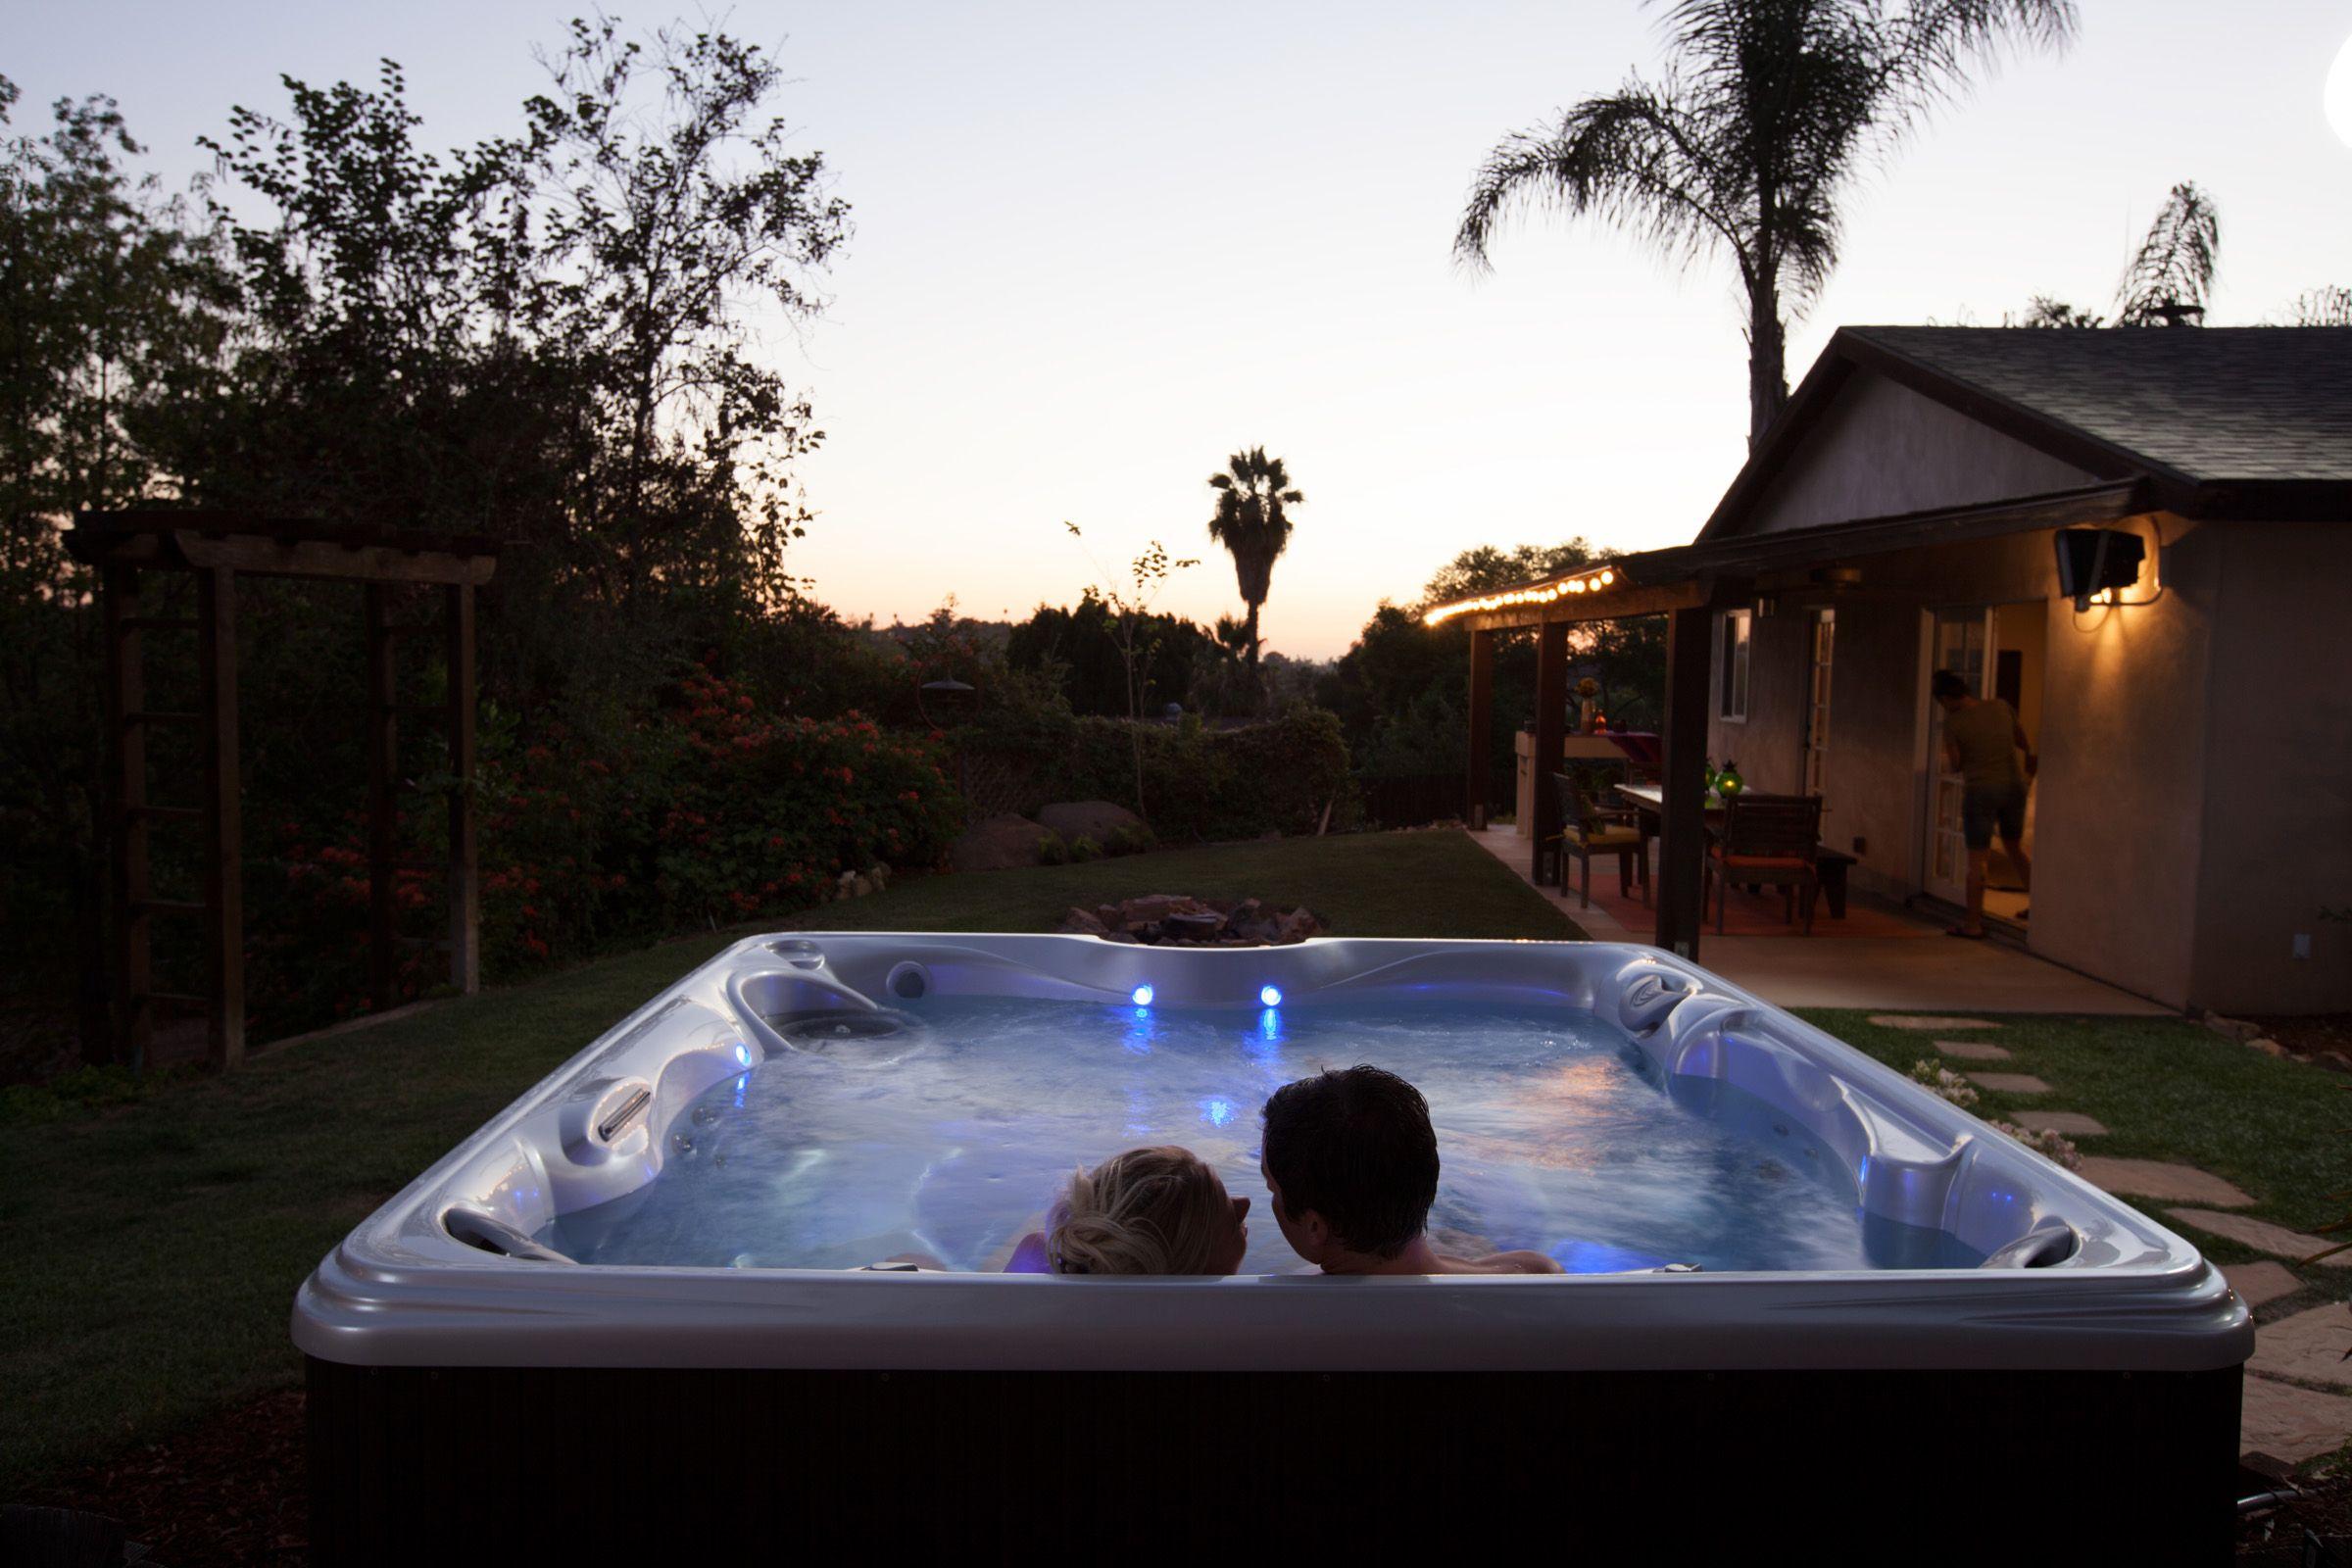 beautiful backyard beautiful view beautiful tub beautiful